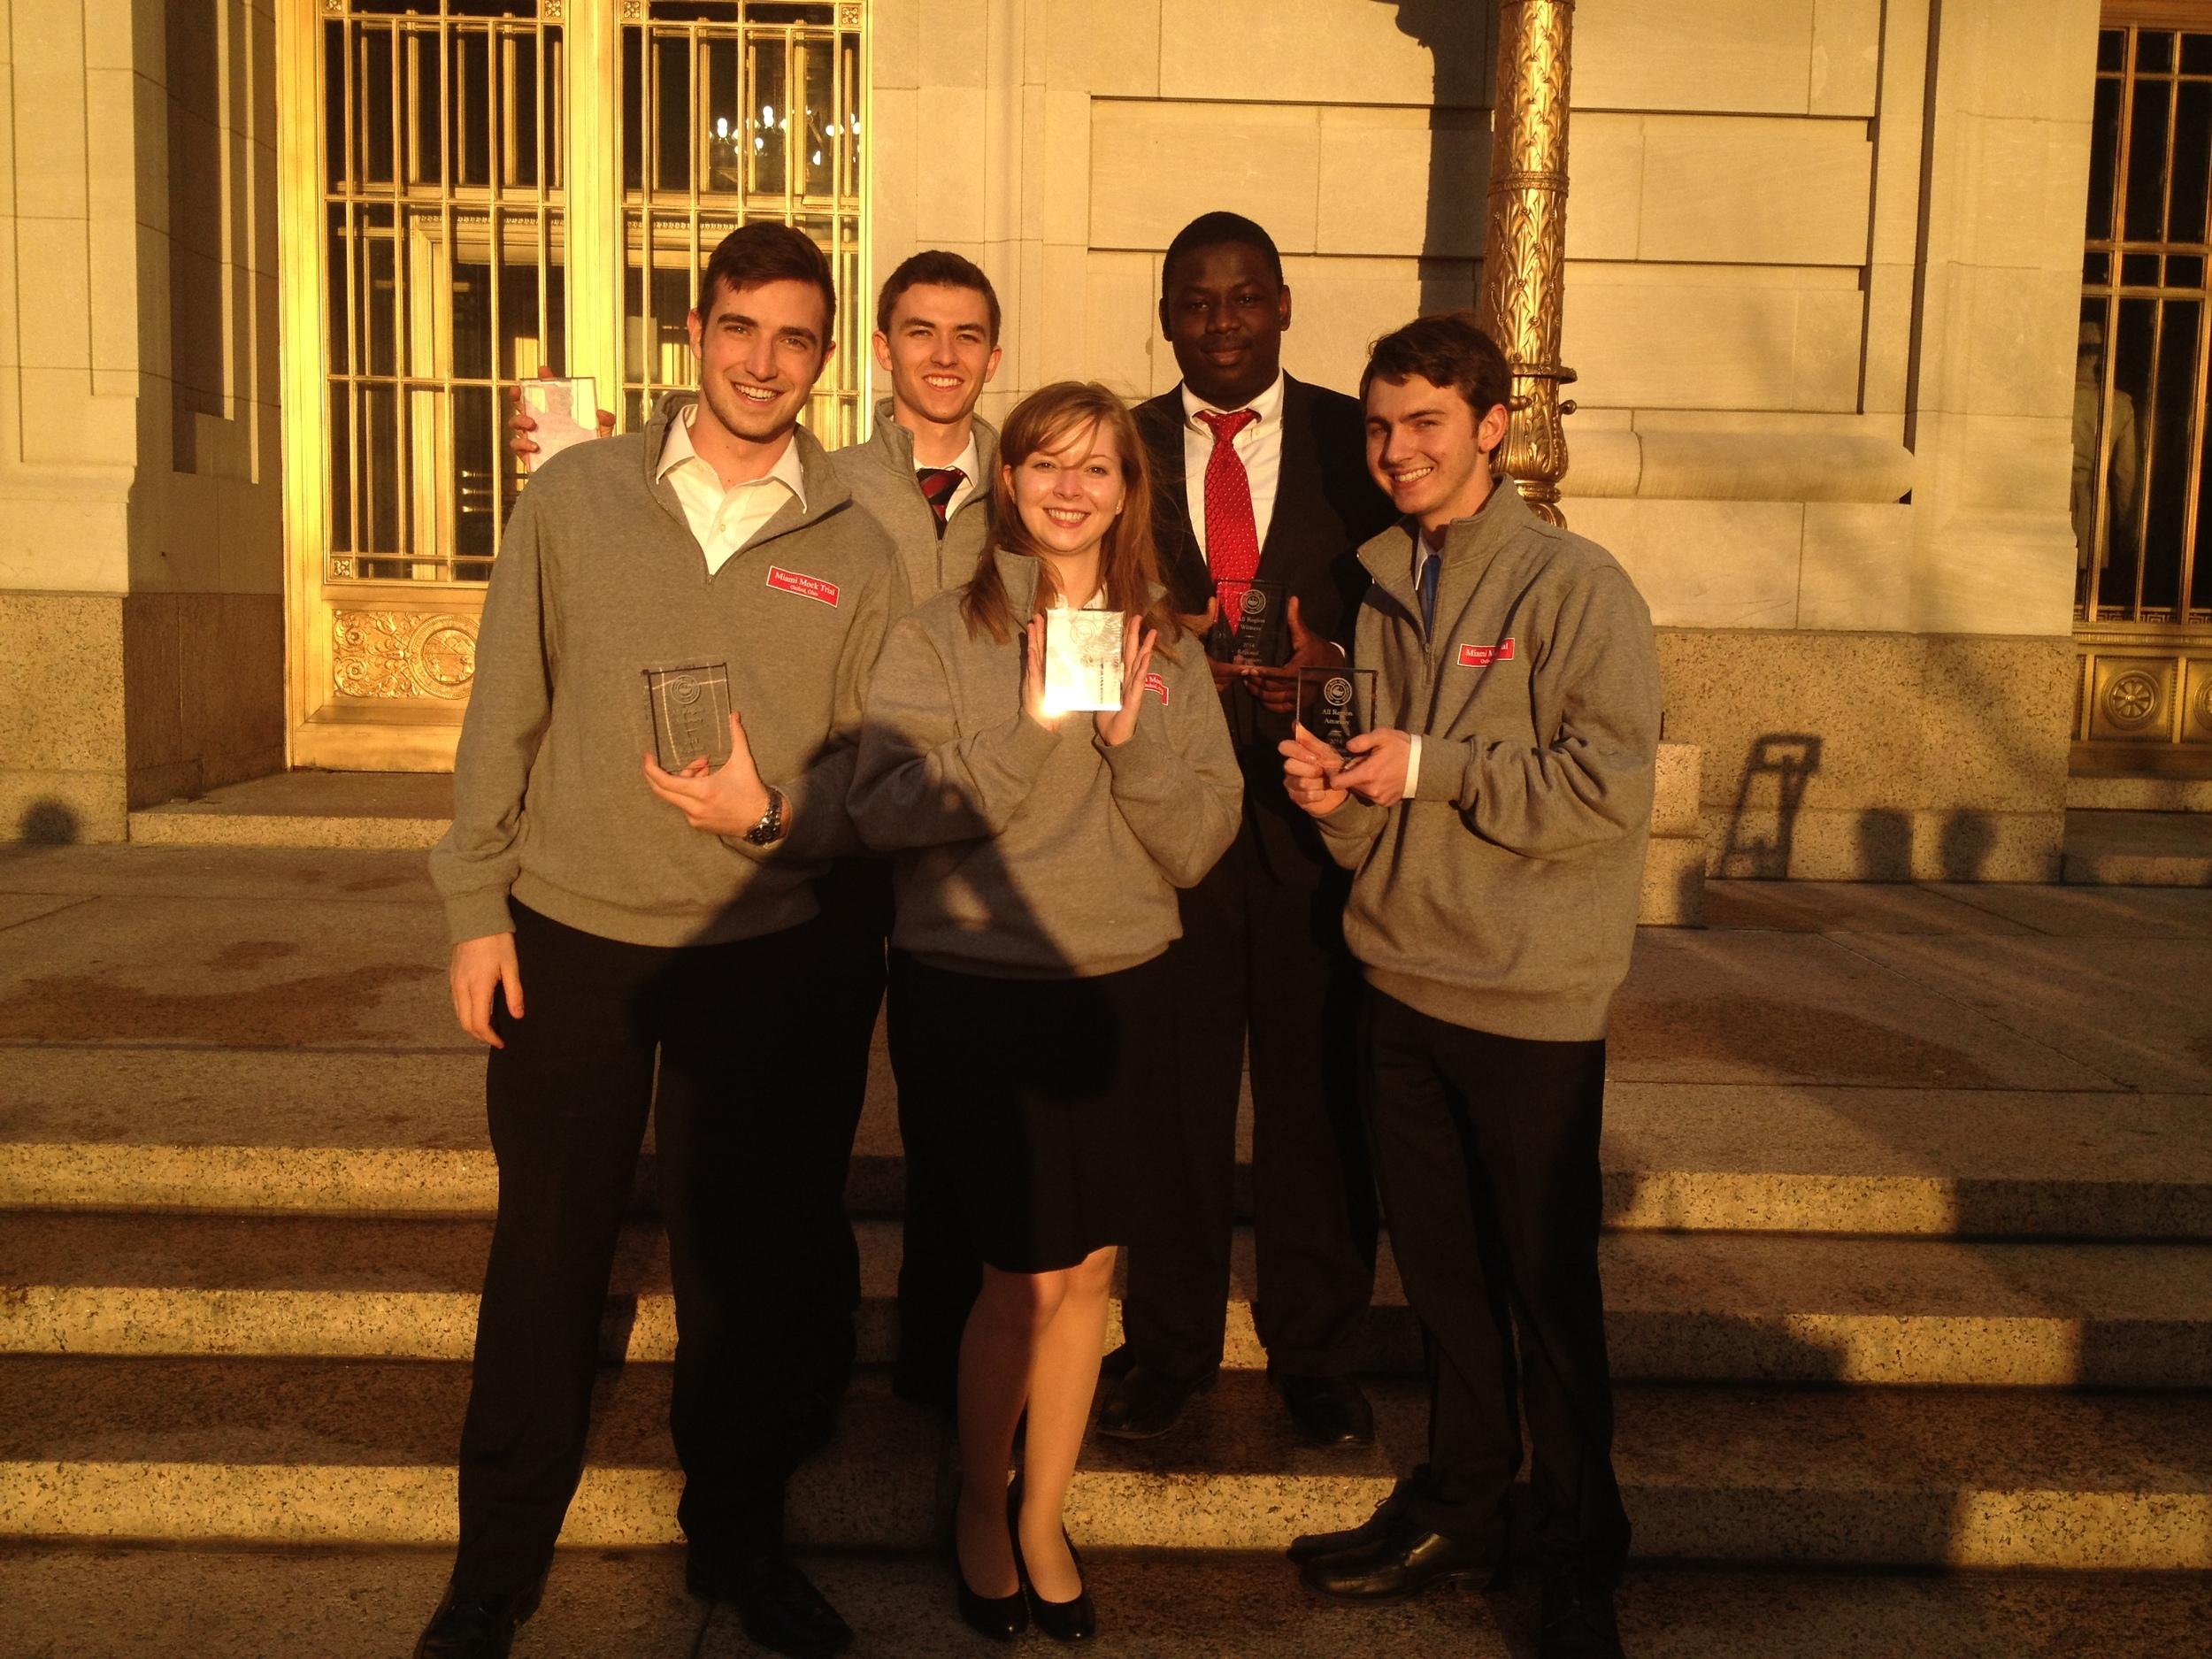 MMT's individual award winners from the Cincinnati, OH regional. Attorneys: Matt Meek (left), John Spear (second to left), Henry Leaman (right). Witnesses: Monika Mudd, Imokhai Okolo.